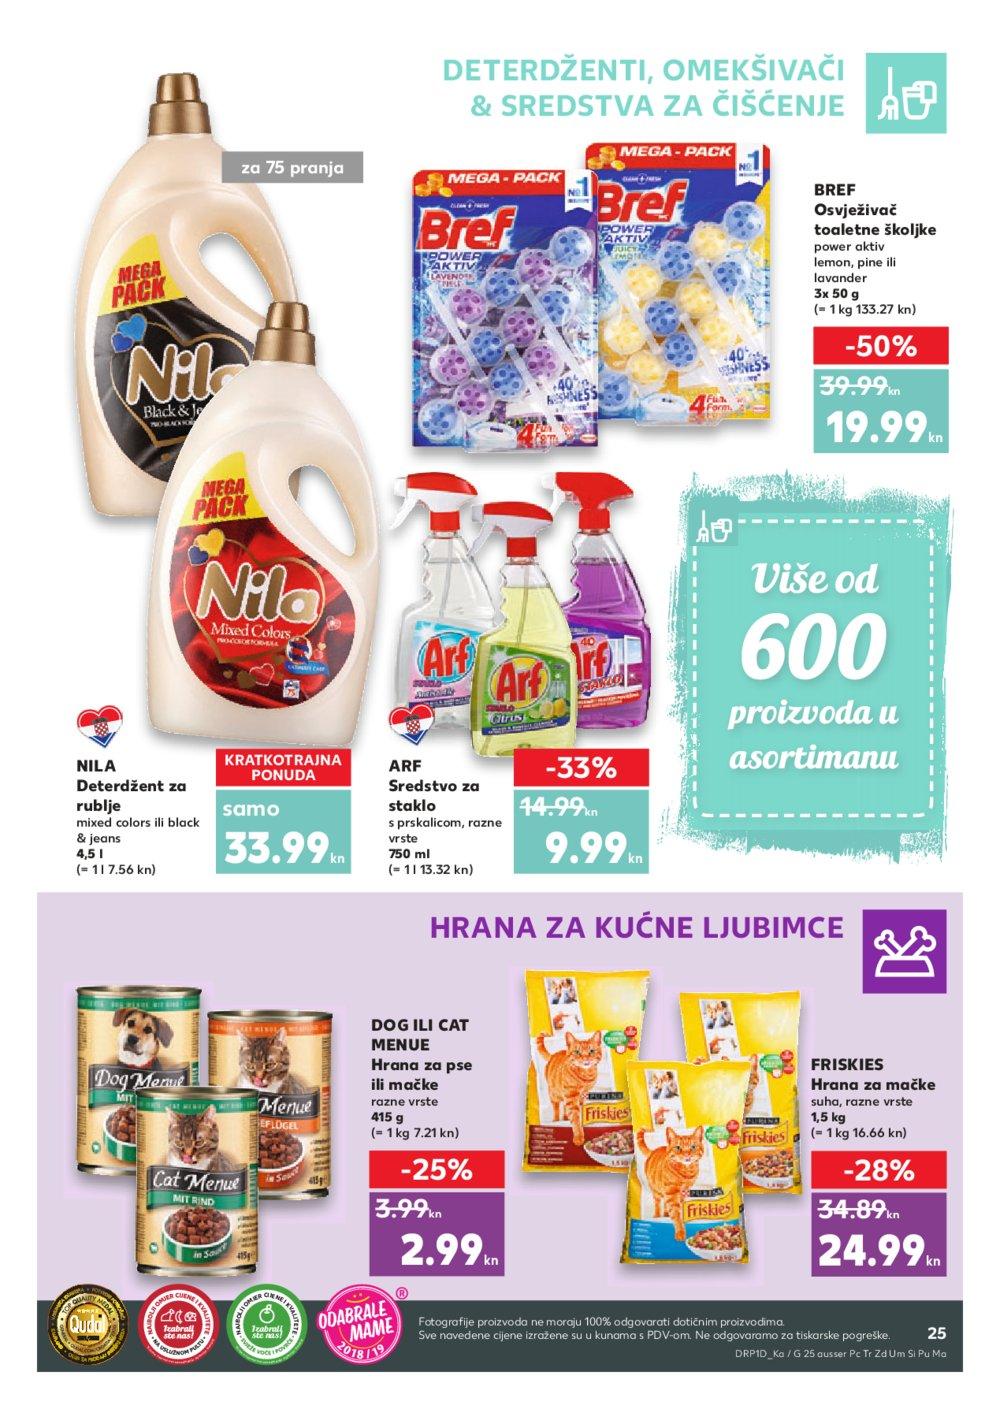 Kaufland katalog Akcija 11.7.-17.7.2019. Vukovara